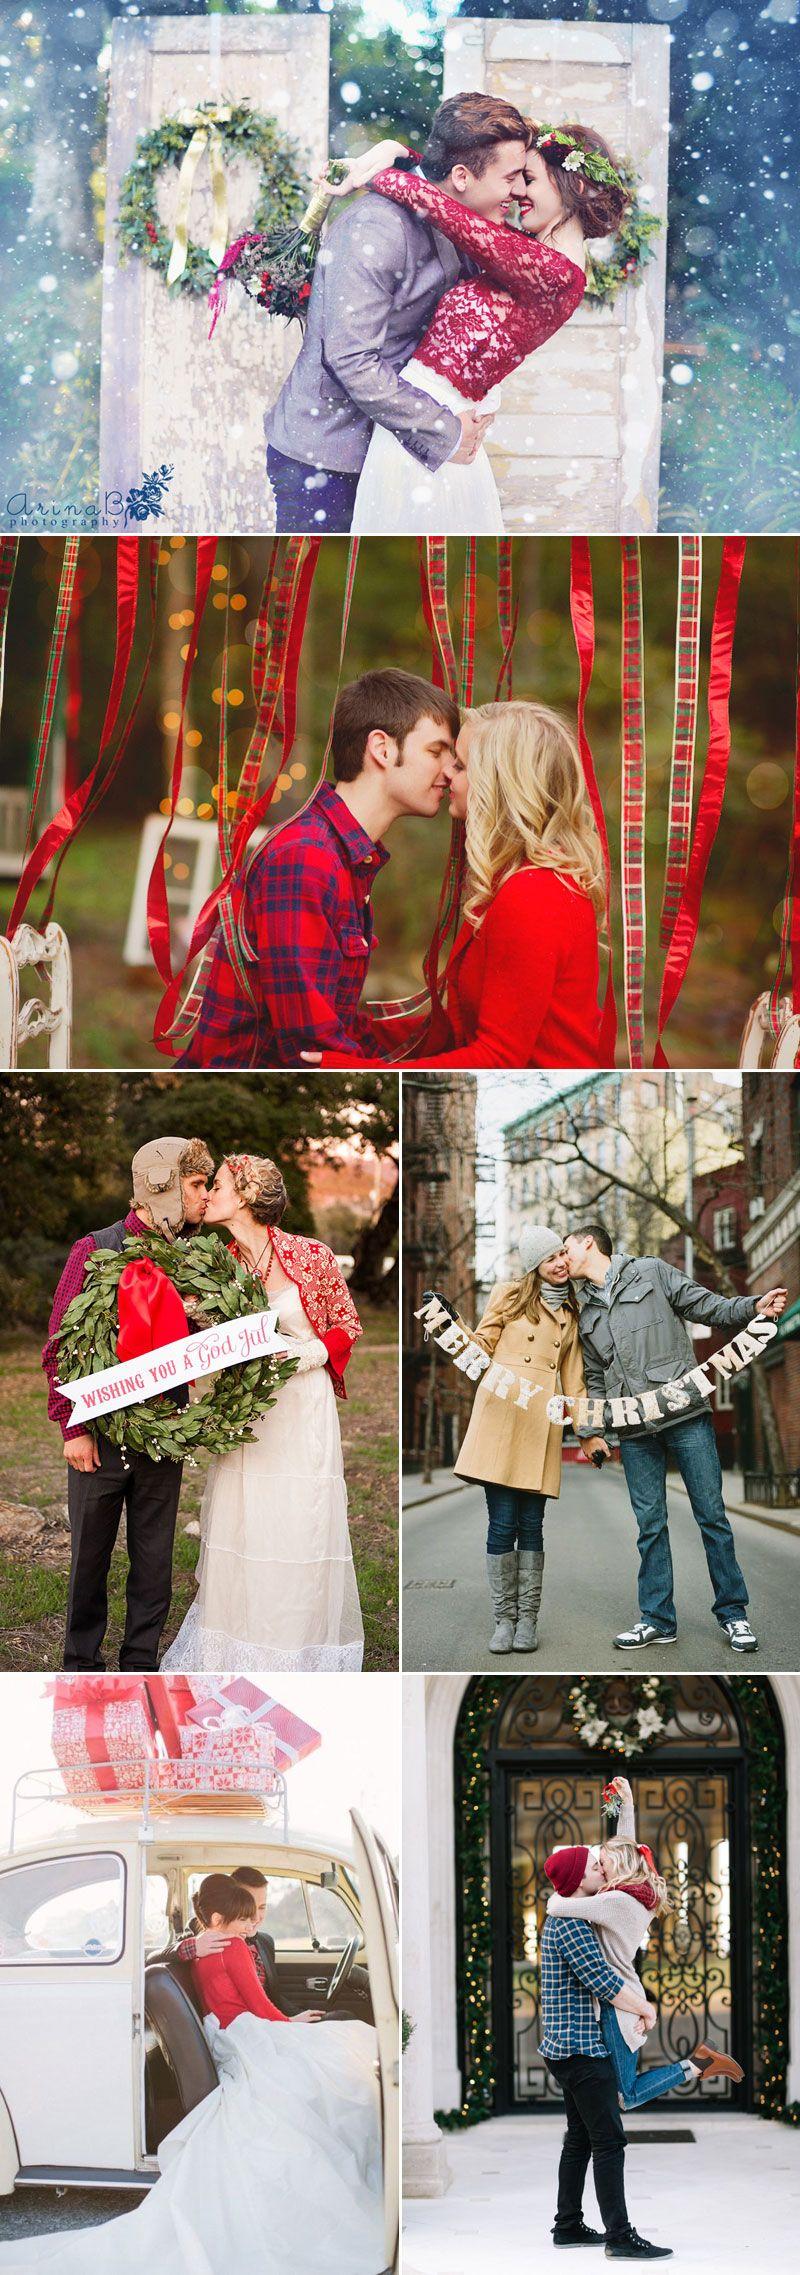 Christmas Session at Minnesota Tree Farm | Christmas couple, Picture ...